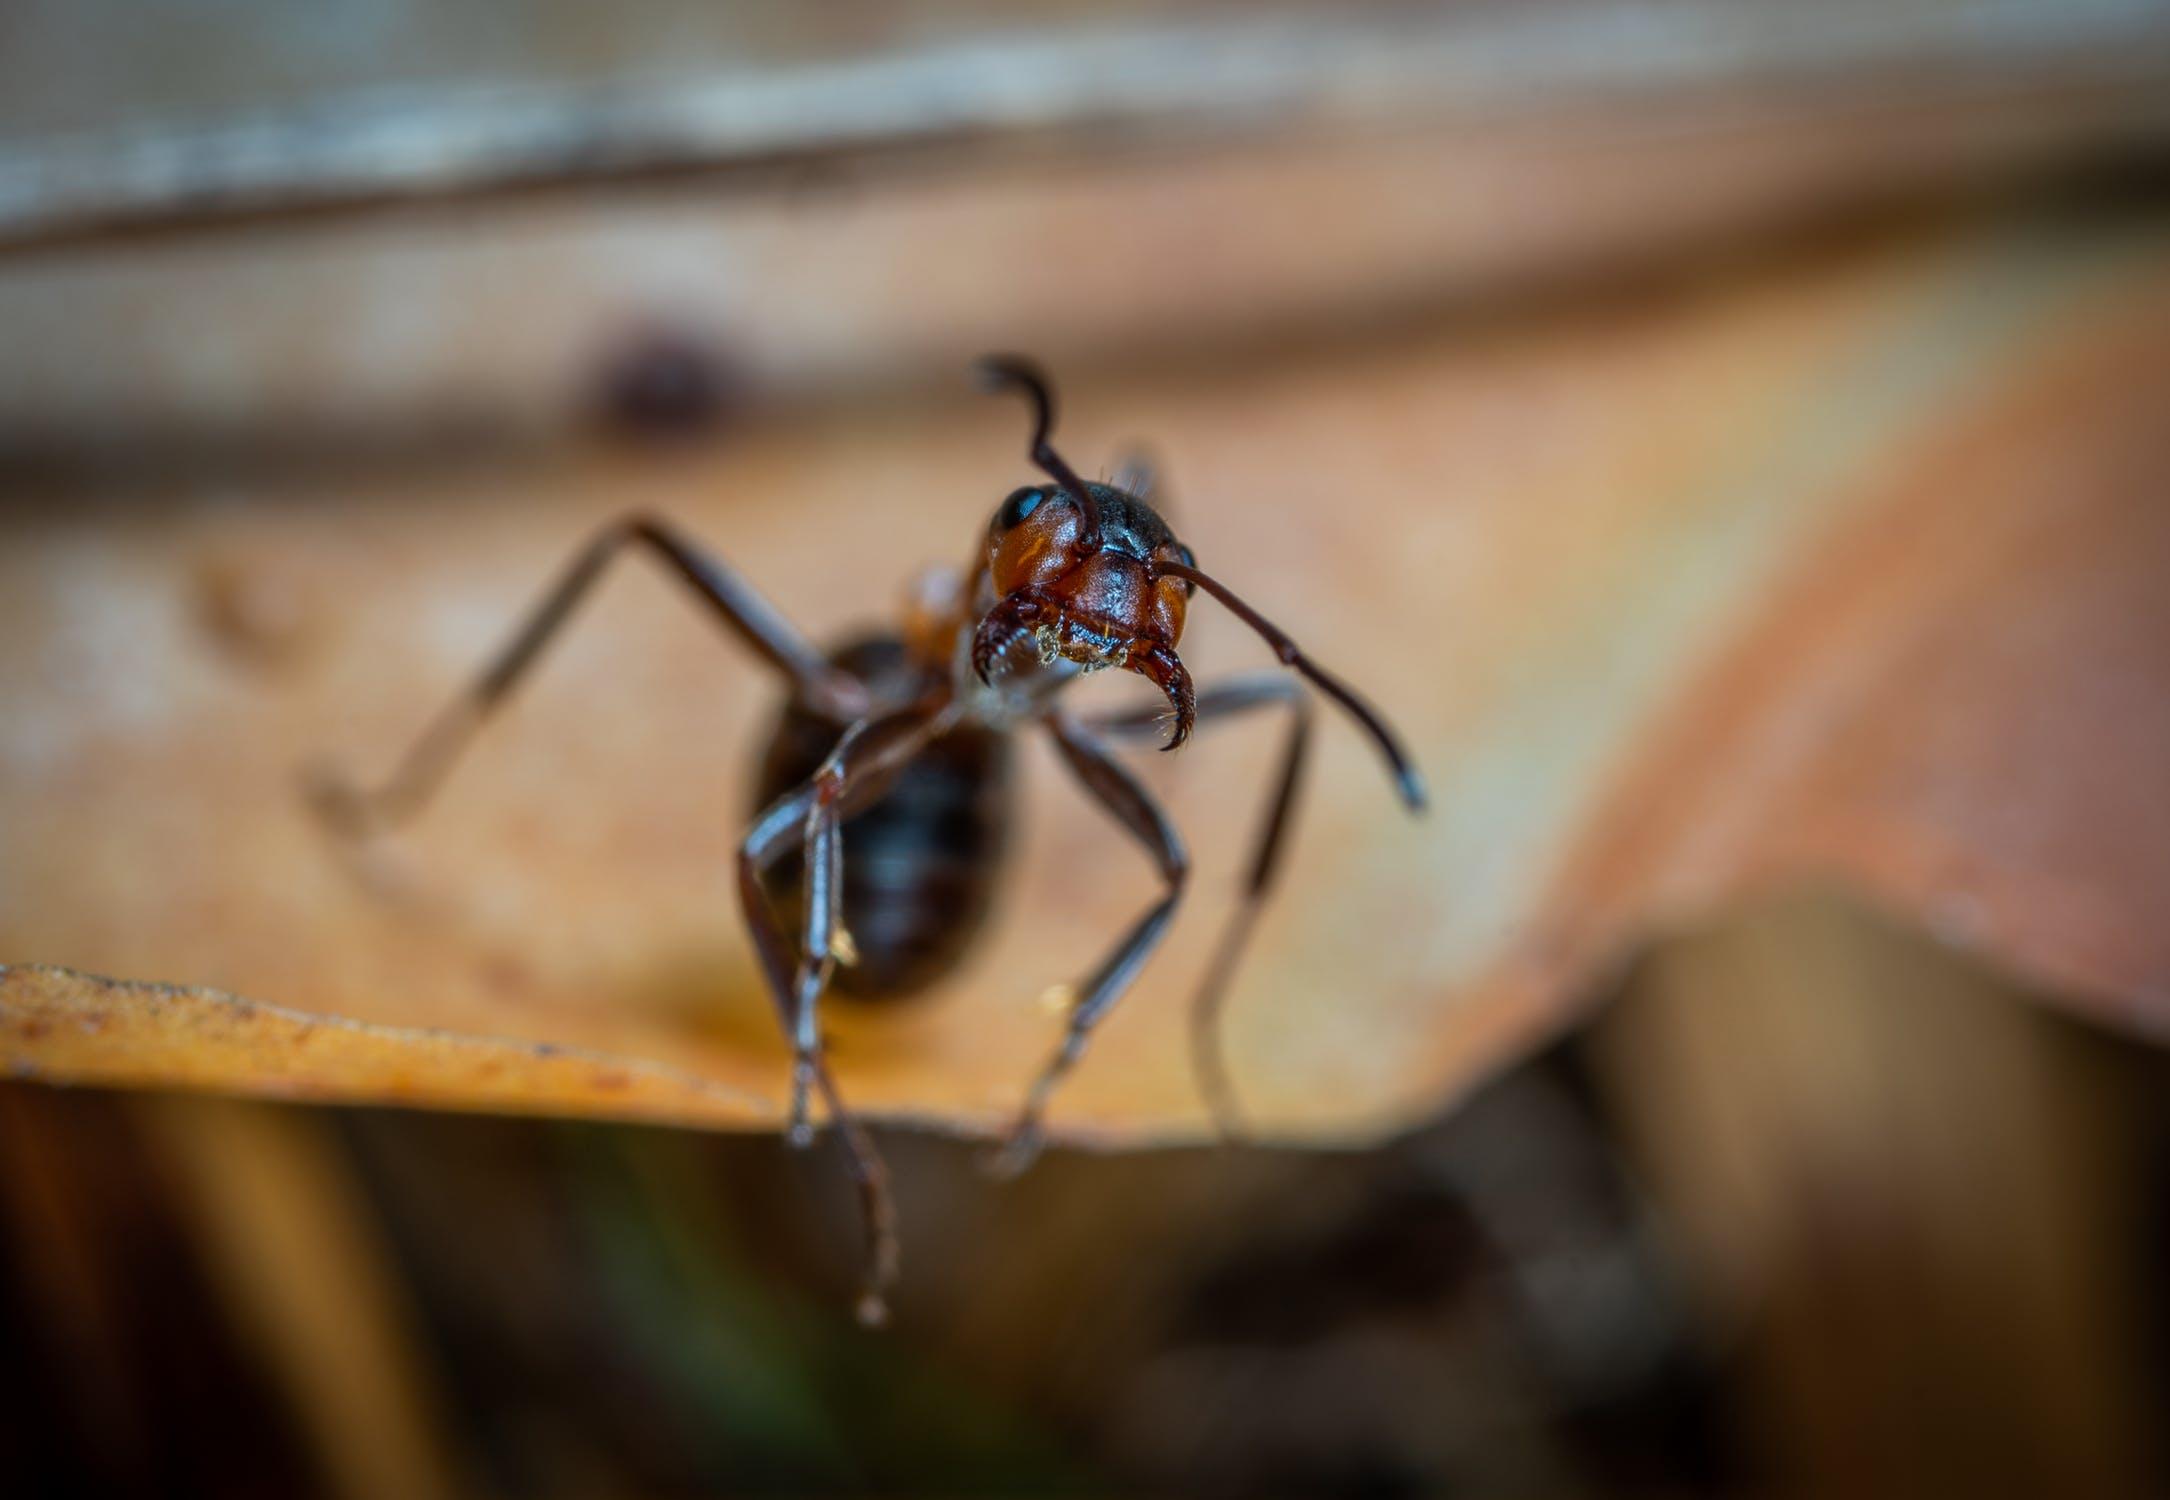 Pest Control Services In Denver Call Our Exterminators